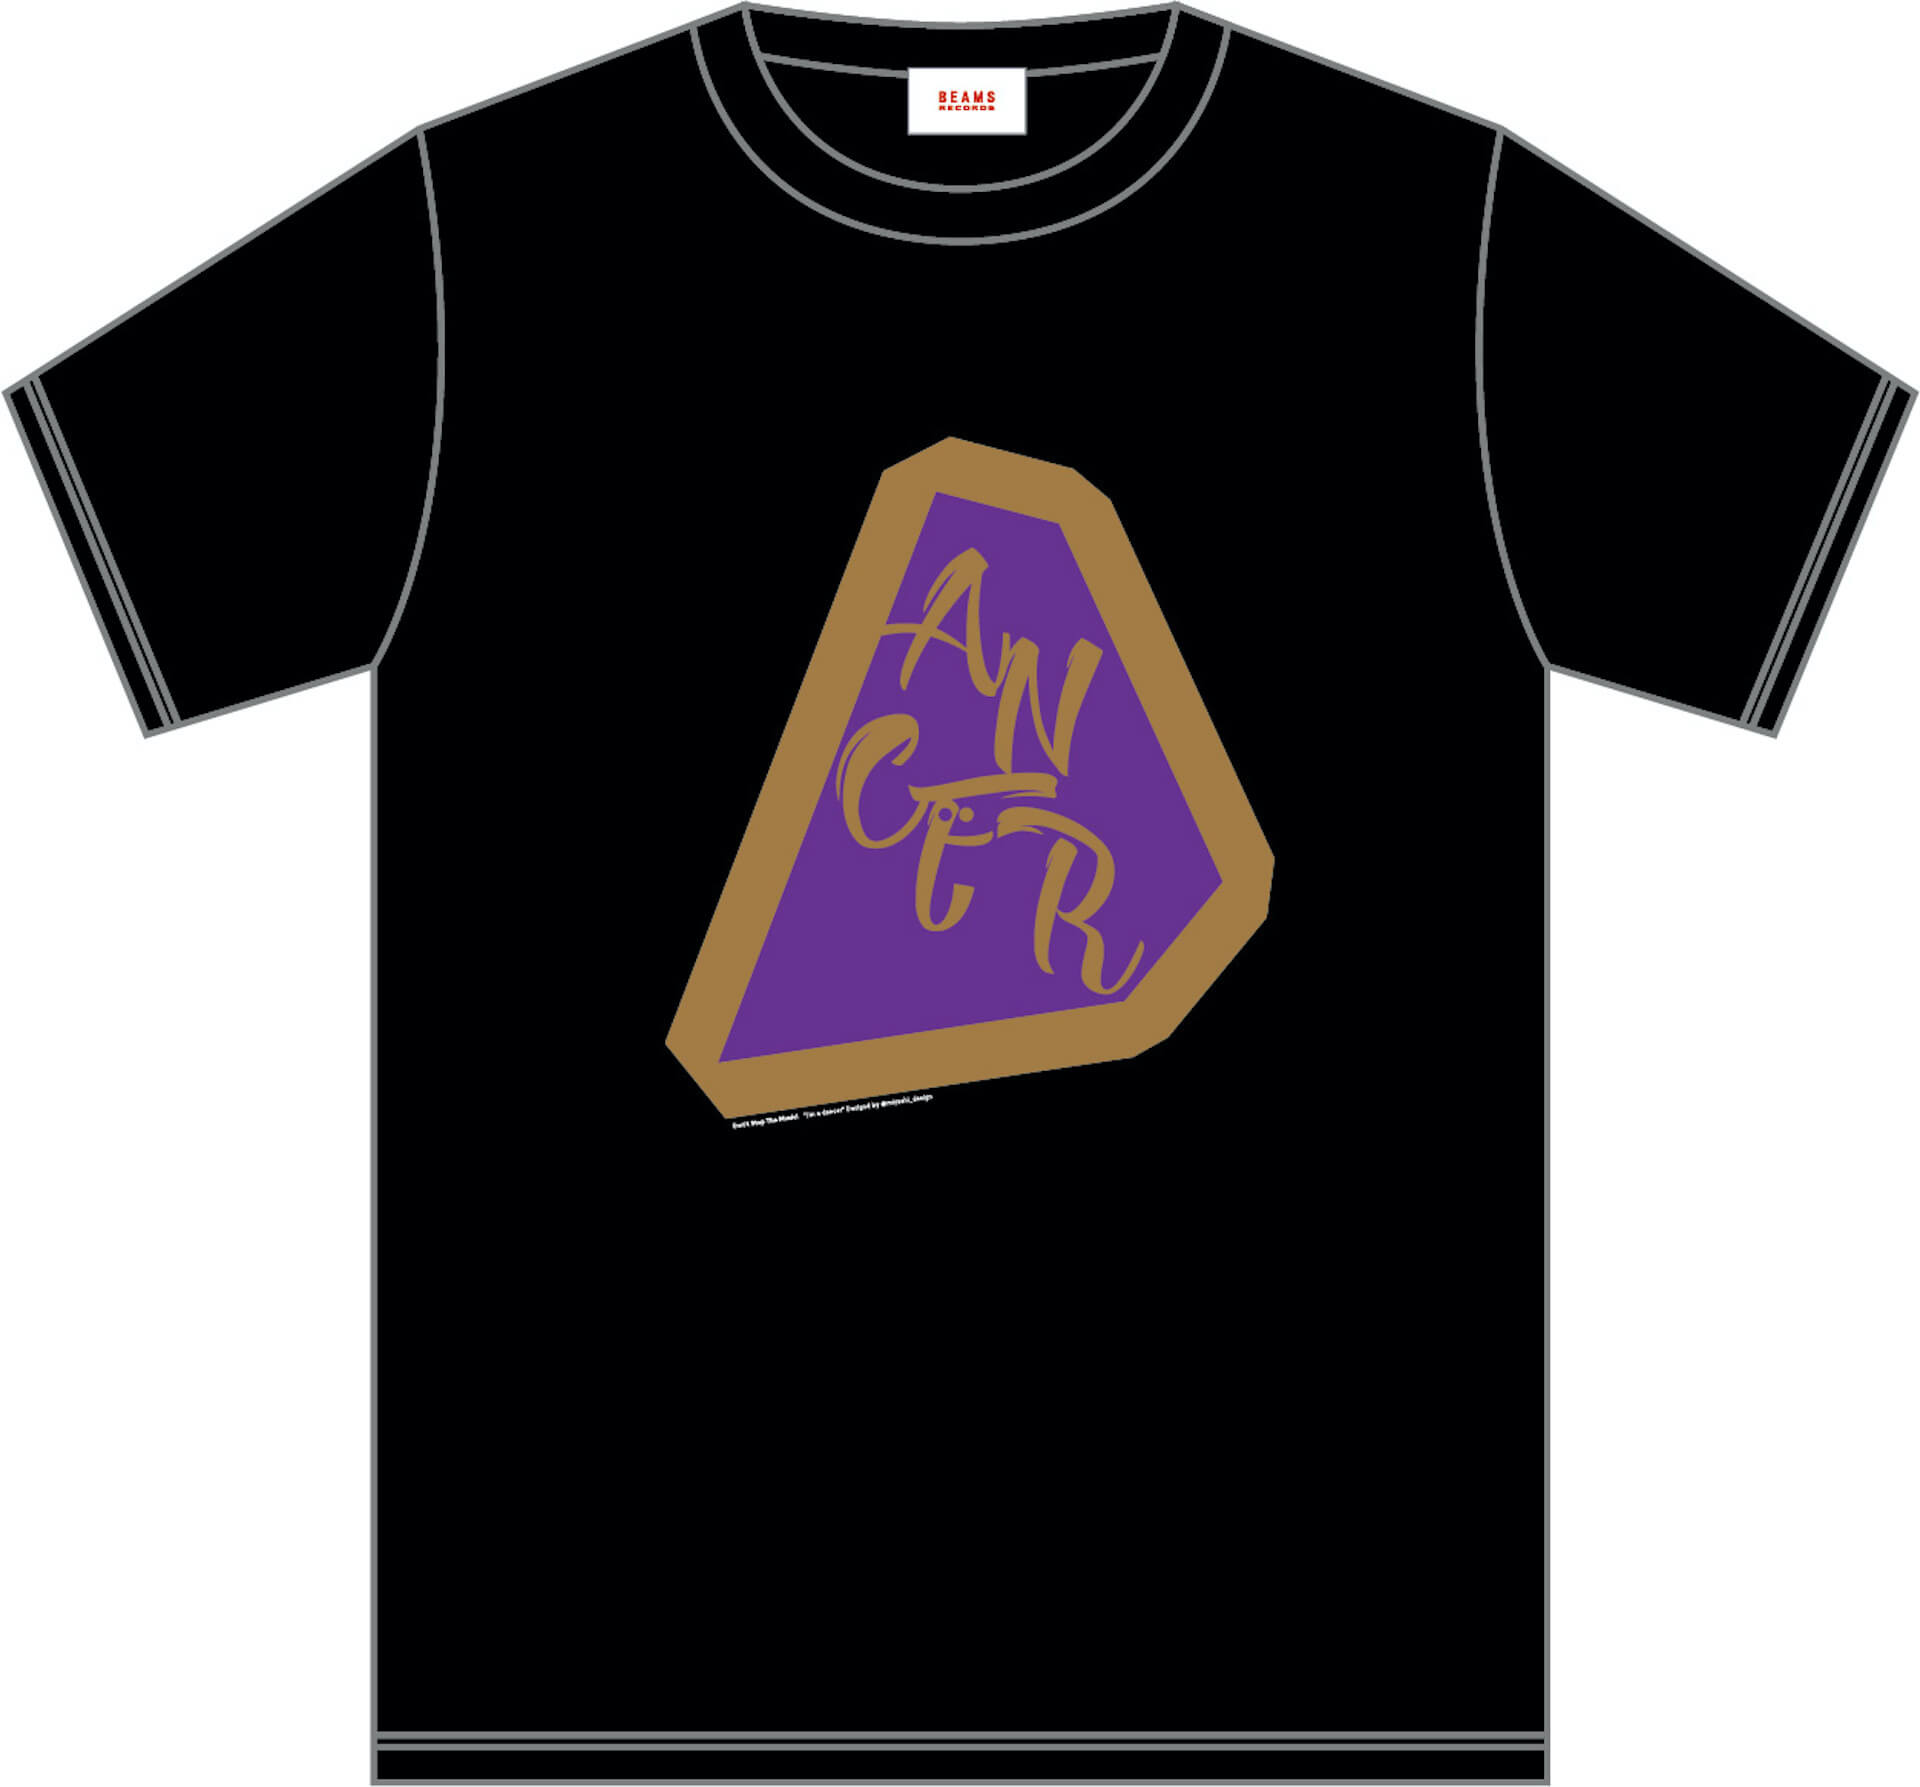 J-WAVE × BEAMS RECORDSのTシャツ第2弾が受注販売開始!本秀康、cherry chill will、TOWA TEIらが参加 music200612_jwave_beamsrecords_06